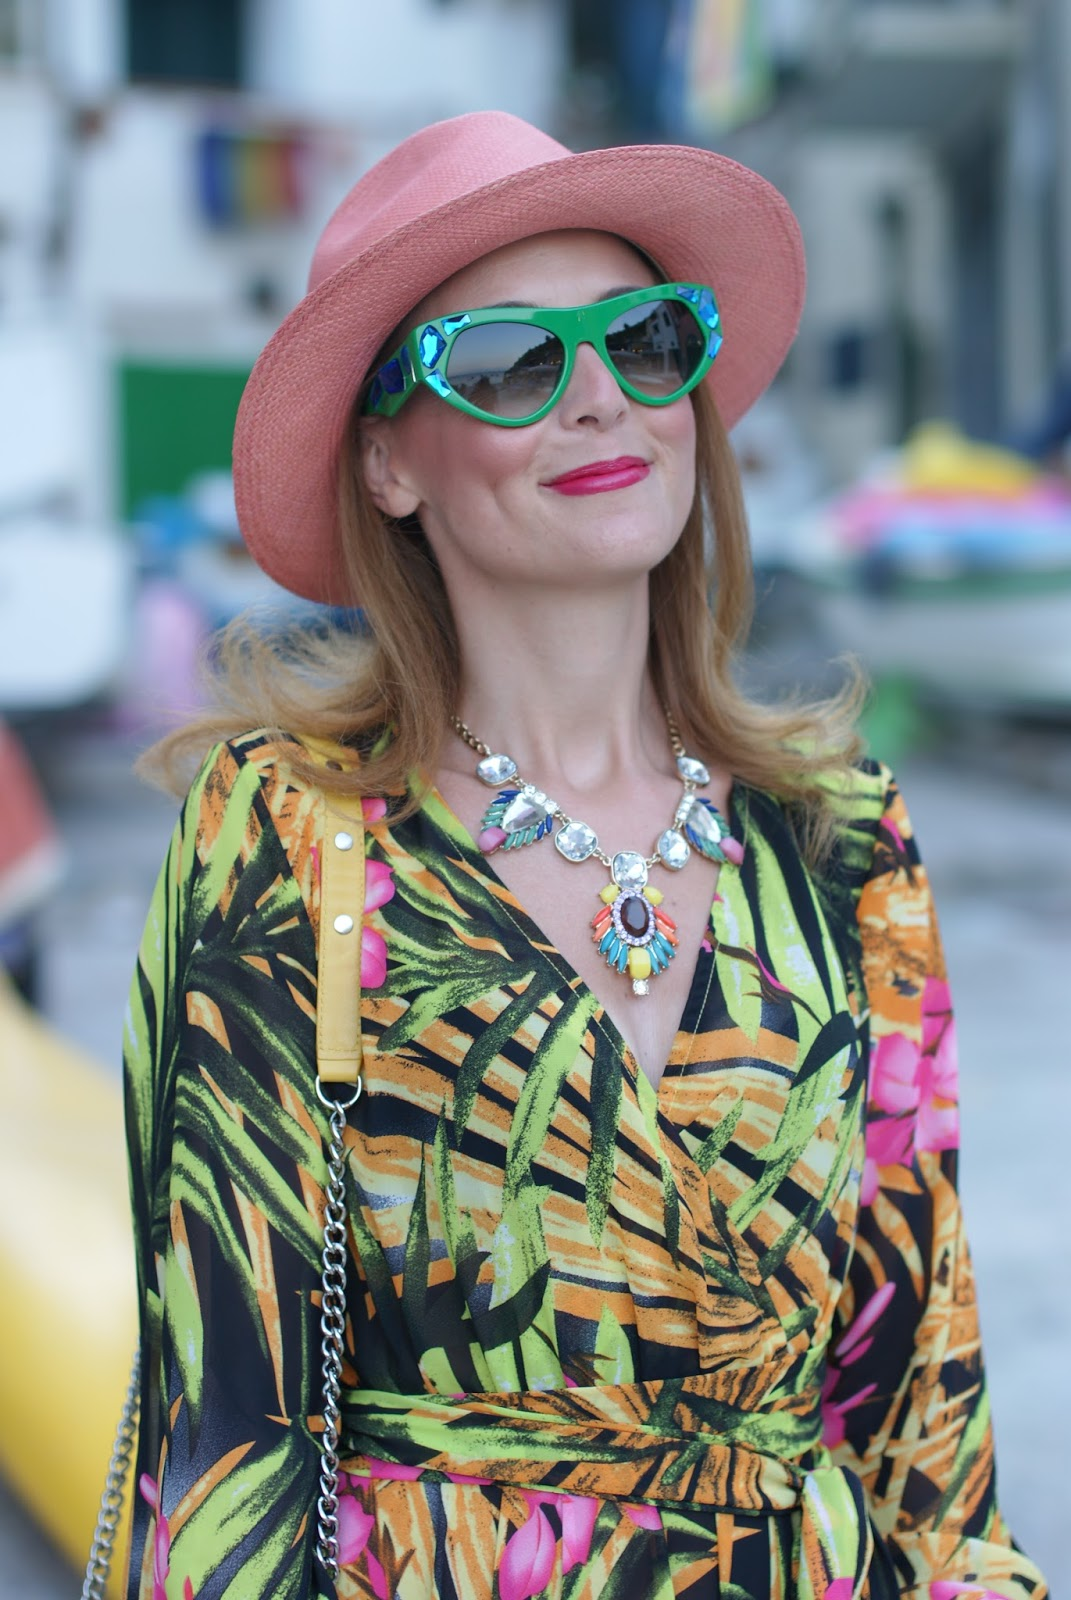 prada voice sunglasses found on giarre dot com, tropical print chiffon maxi dress, ecua-andino hat for a summer boho style on Fashion and Cookies fashion blog, fashion blogger style